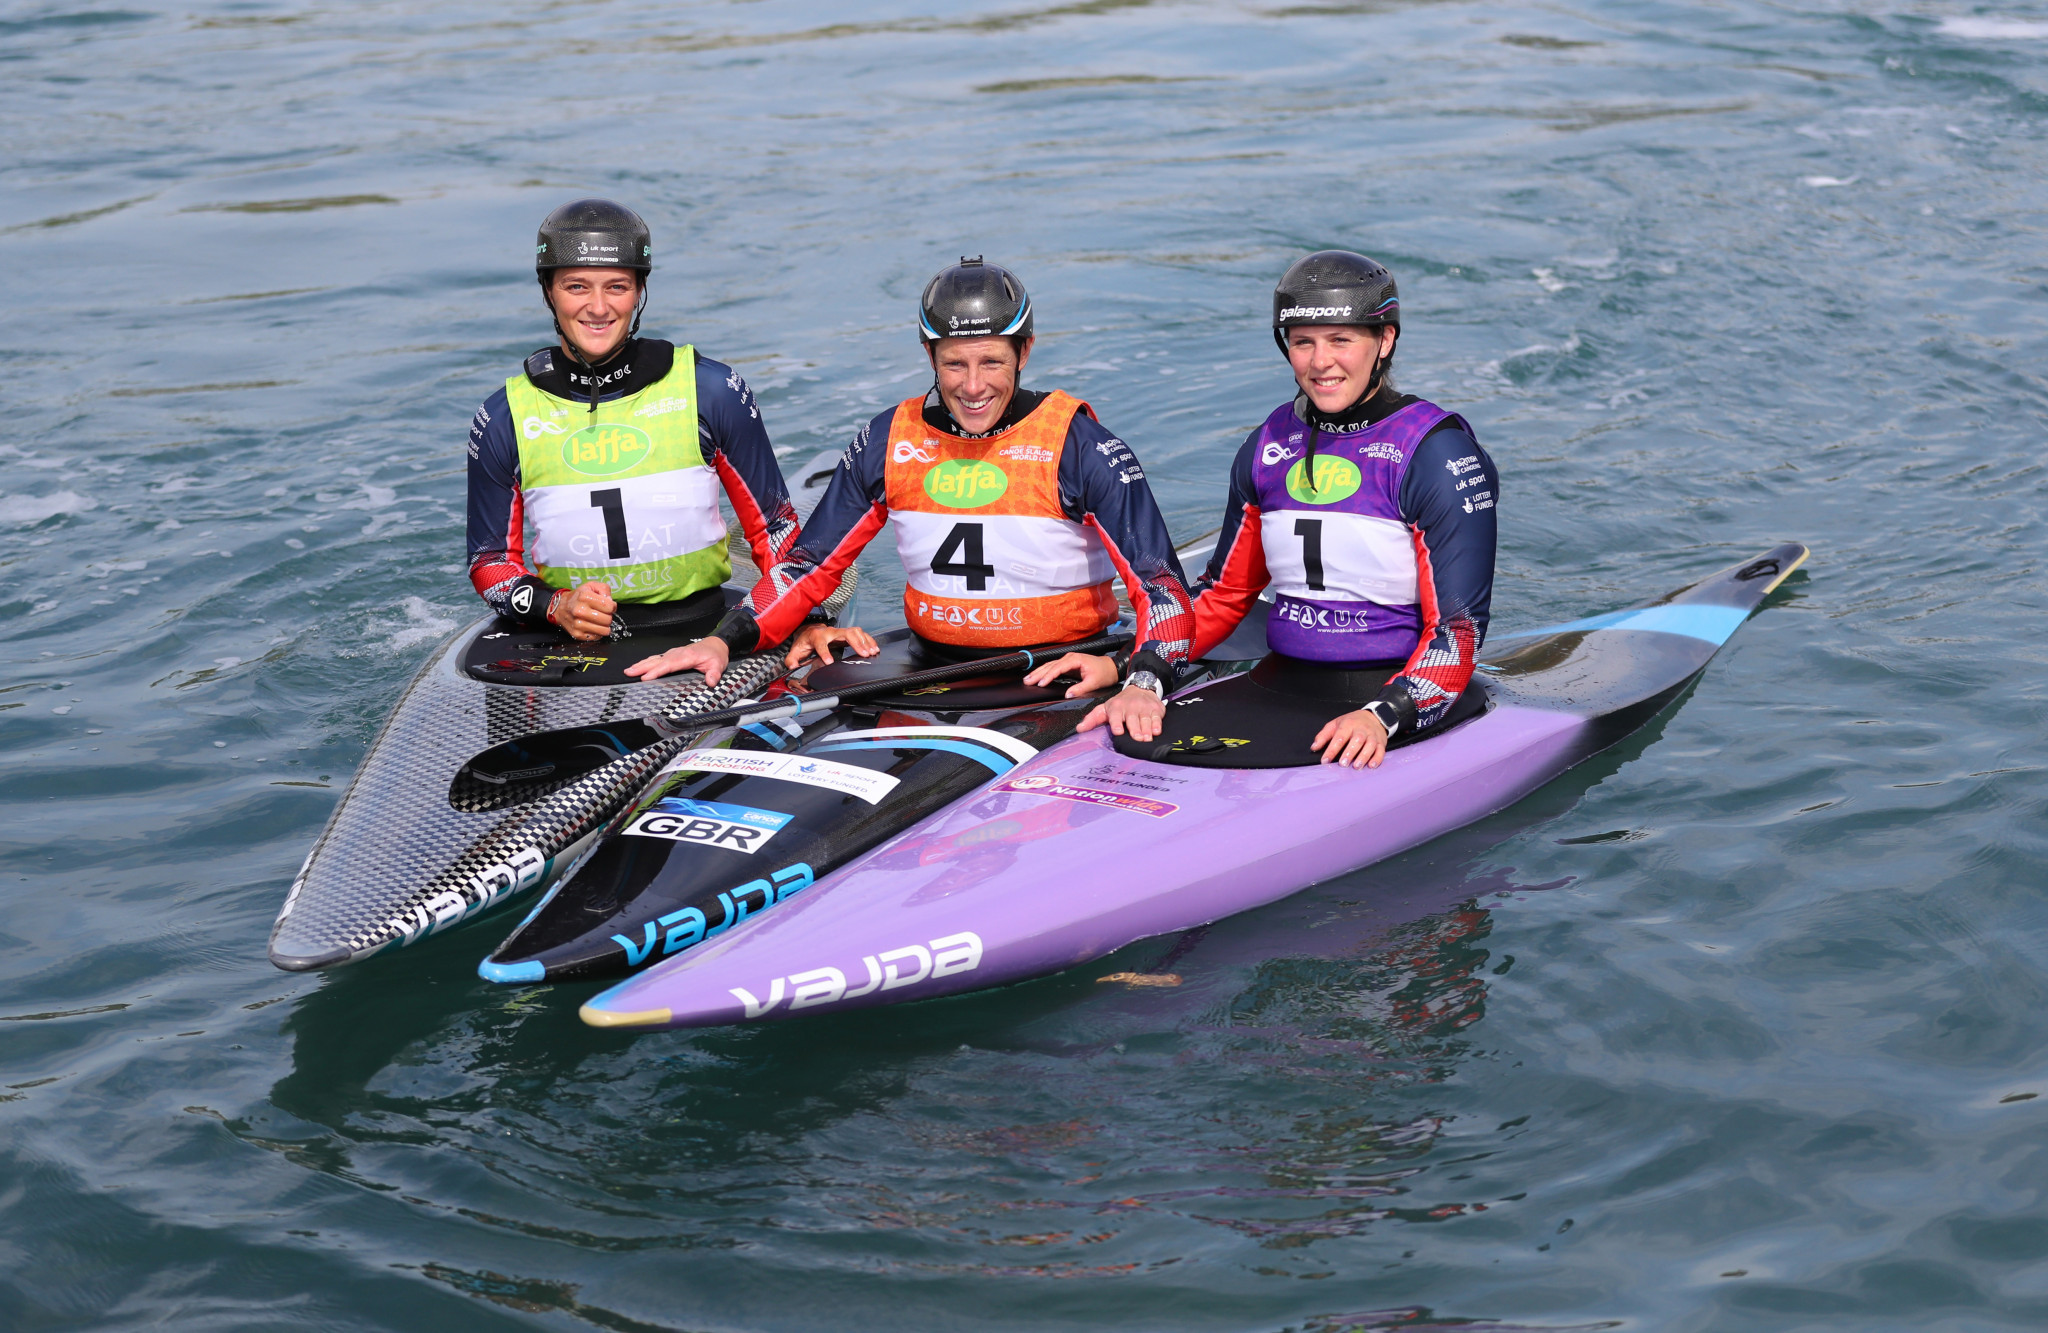 Britain, Czech Republic and Slovakia enjoy team success at Canoe Slalom European Championships